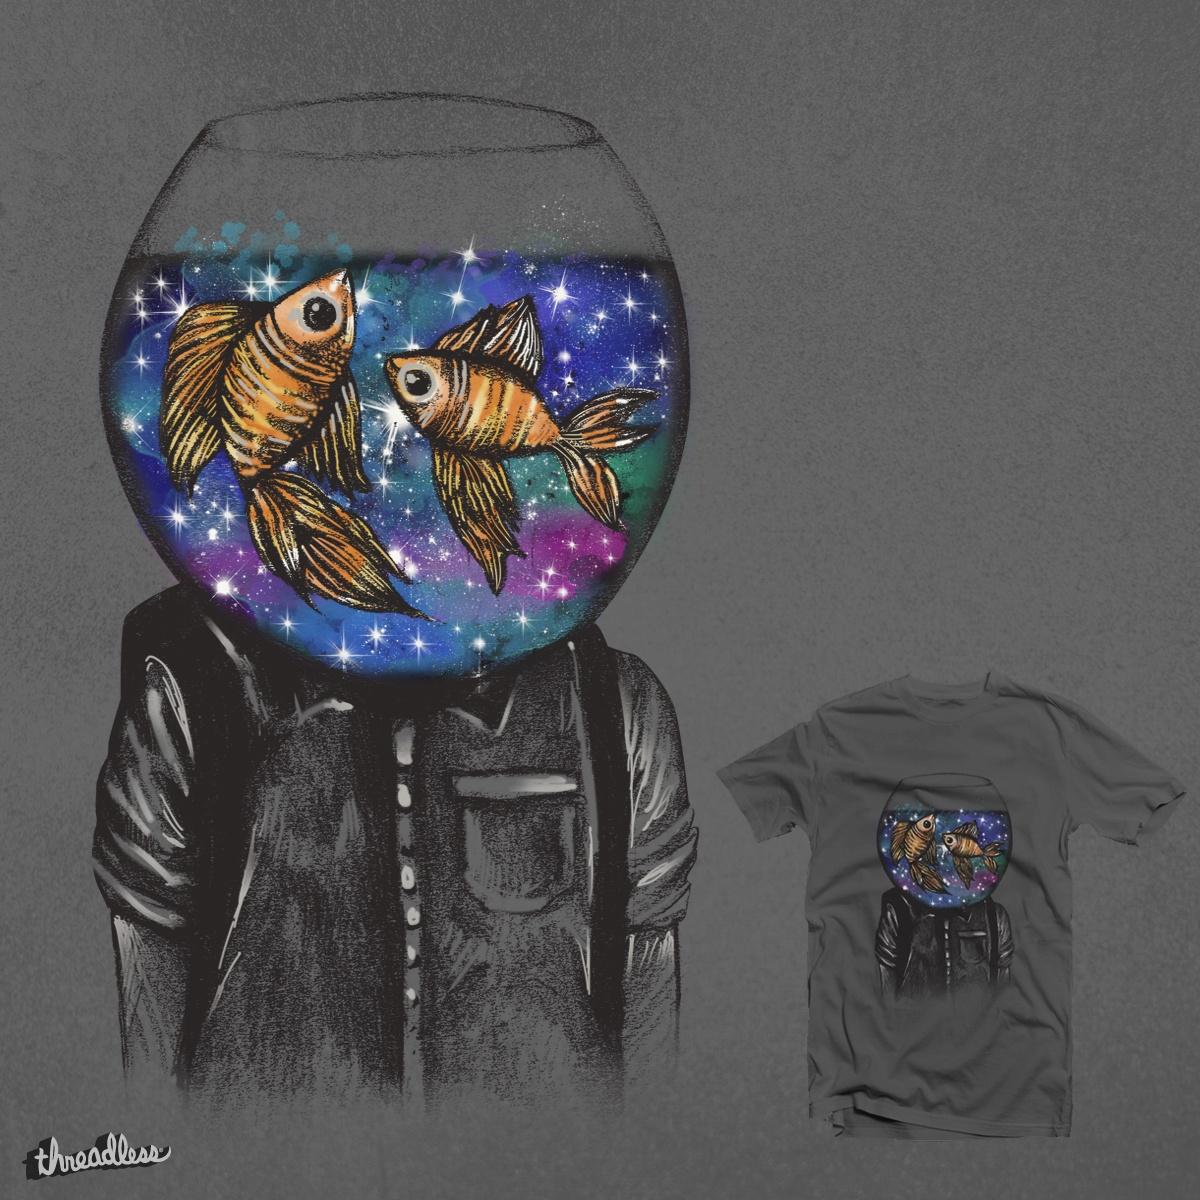 Swim Around My Cosmic Dreams by dandingeroz on Threadless